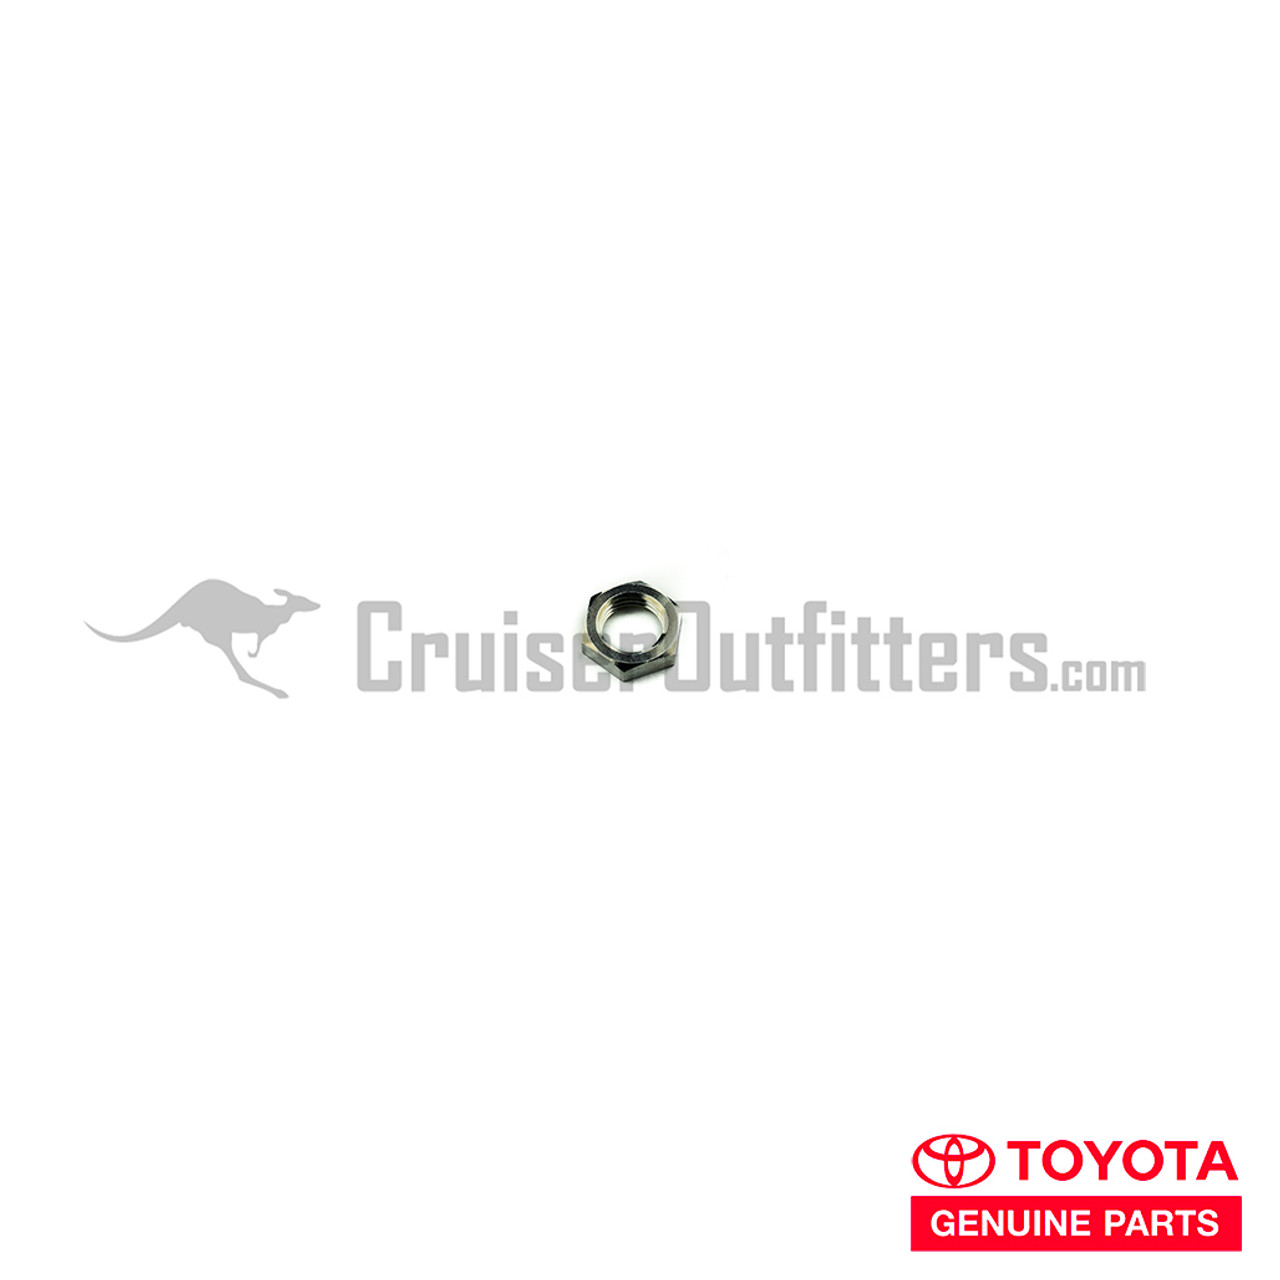 Steering Stop Jam Nut - OEM Toyota - Fits 100/470 (ST14057)